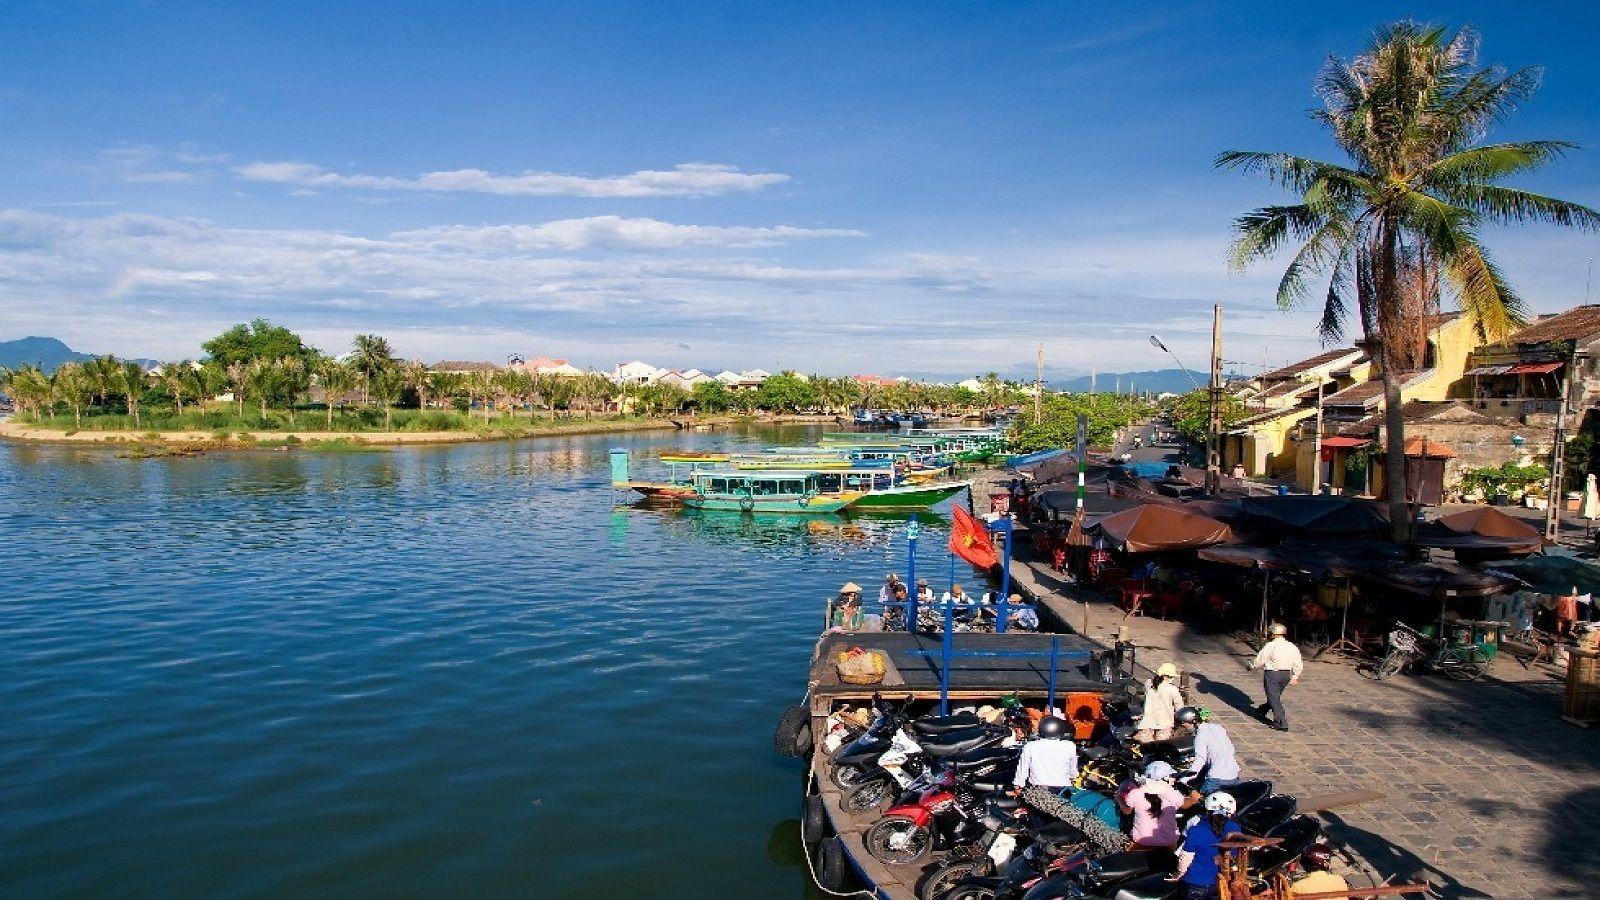 Boats docked on the Da Nang river